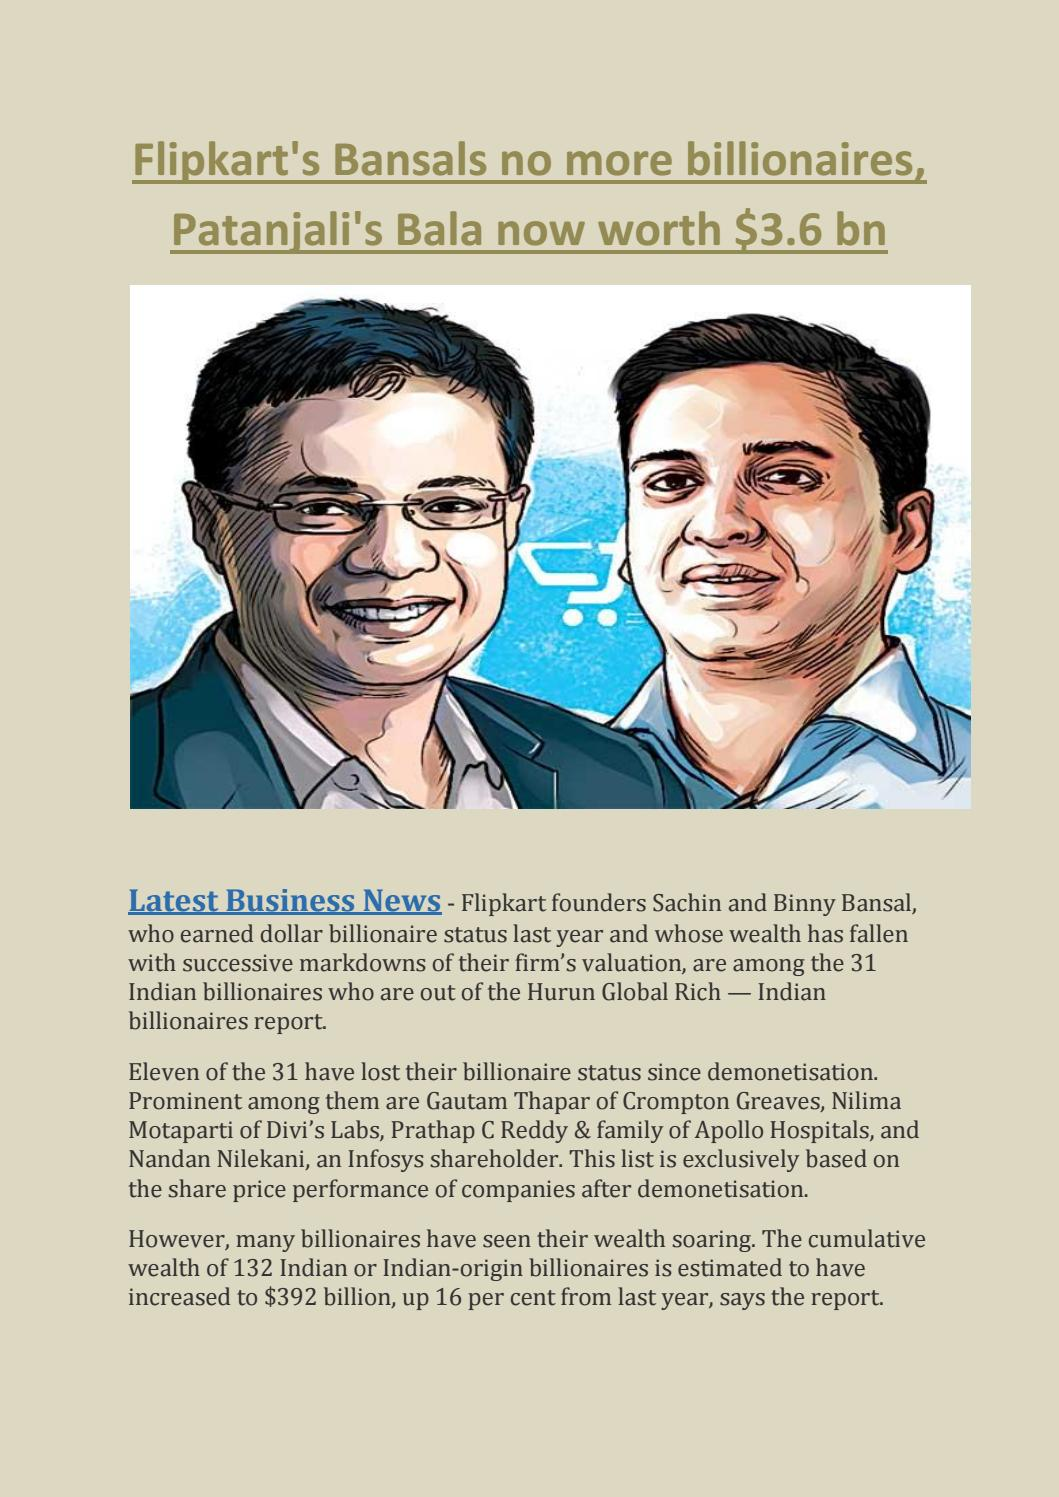 Flipkart's bansals no more billionaires, patanjali's bala